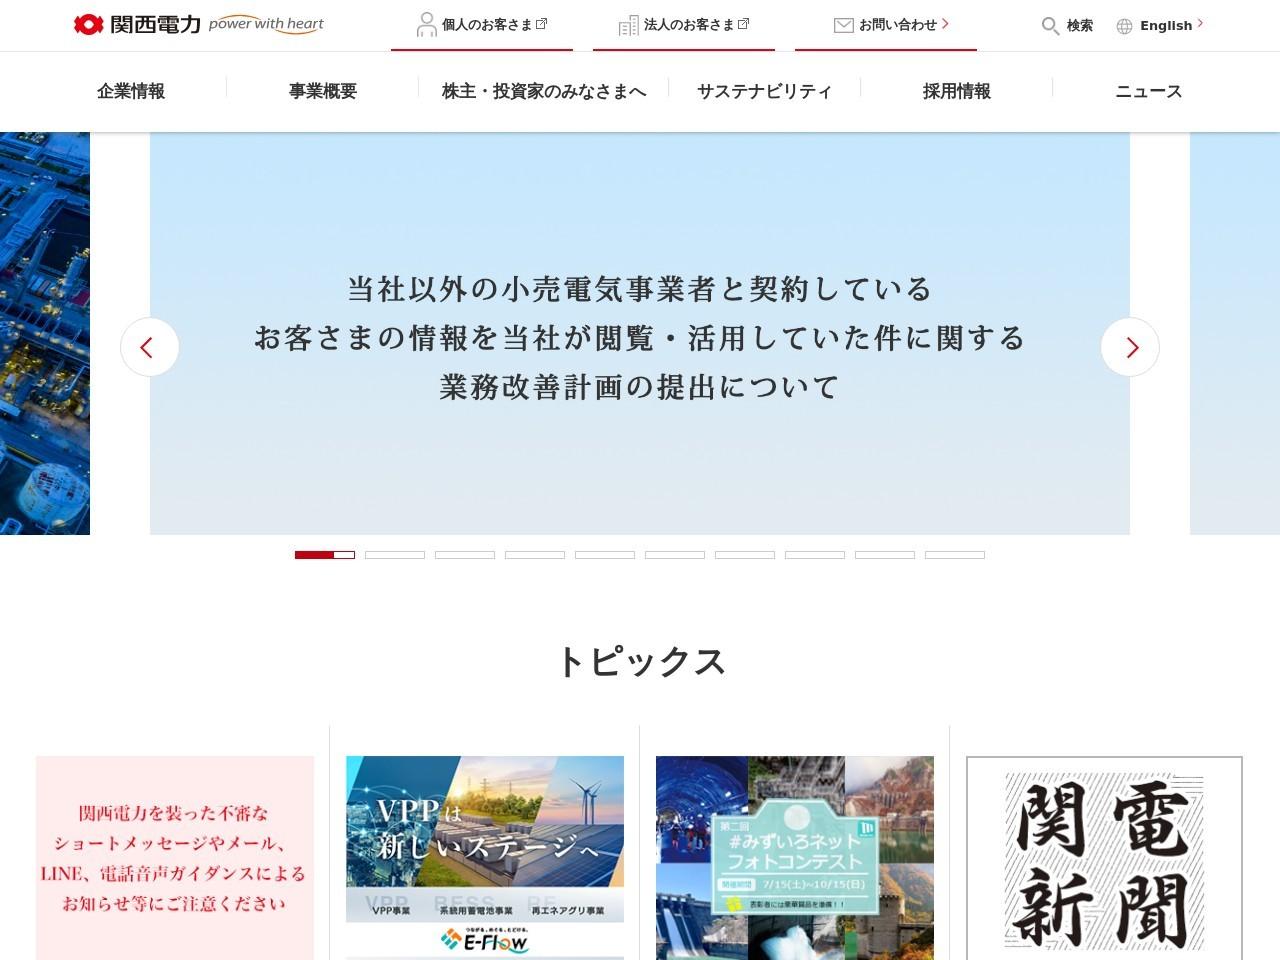 http://www.kepco.co.jp/energy_supply/supply/teiden-info/